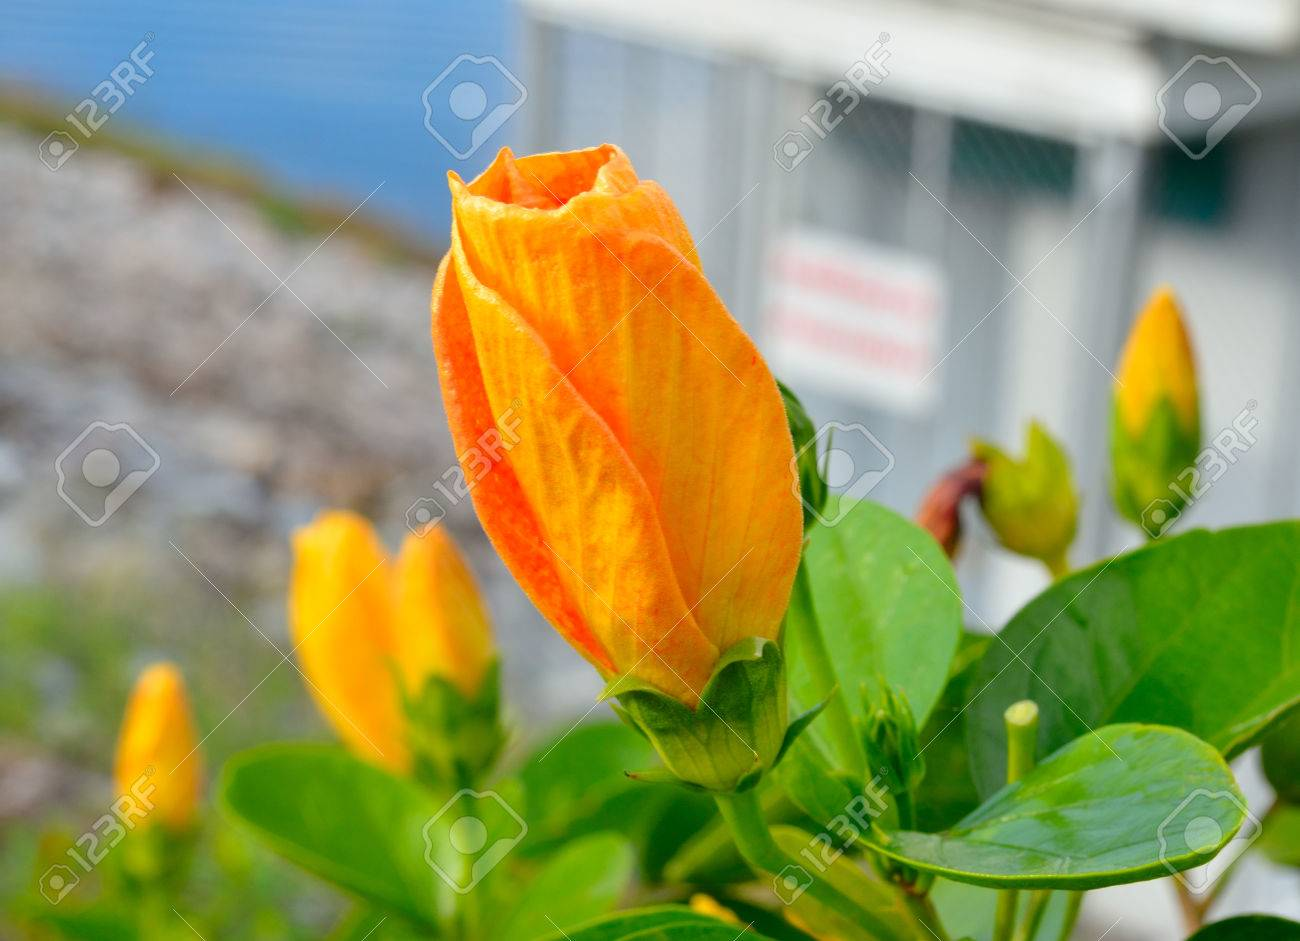 Orange chinese hibiscus flower or china rose hawaiian hibiscus stock photo orange chinese hibiscus flower or china rose hawaiian hibiscus shoeblackplant rose mallow its latin name is hibiscus rosa sinensis izmirmasajfo Choice Image